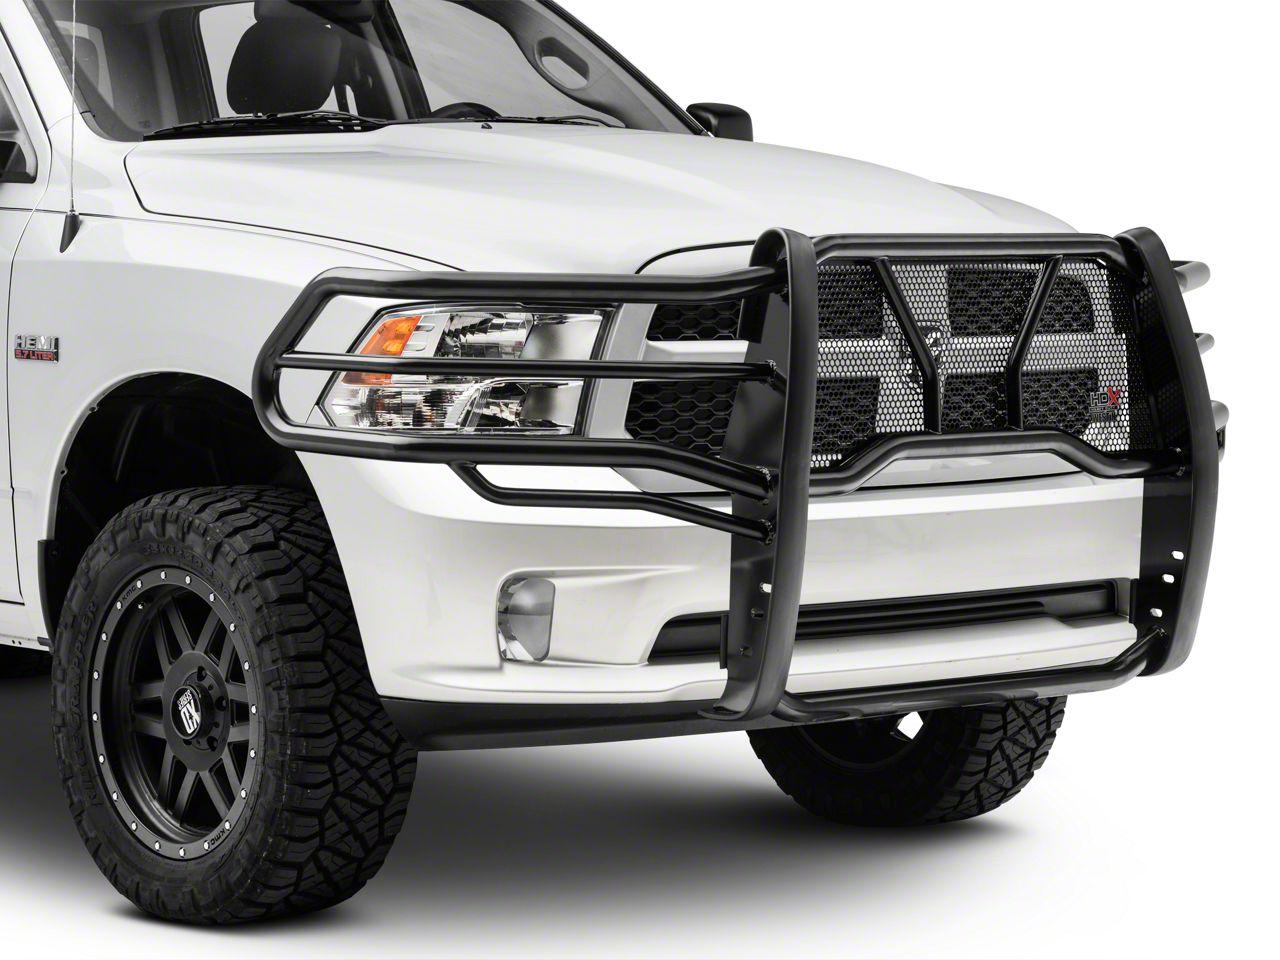 Westin HDX Winch Mount Grille Guard - Black (09-18 RAM 1500, Excluding Express, Sport & Rebel)